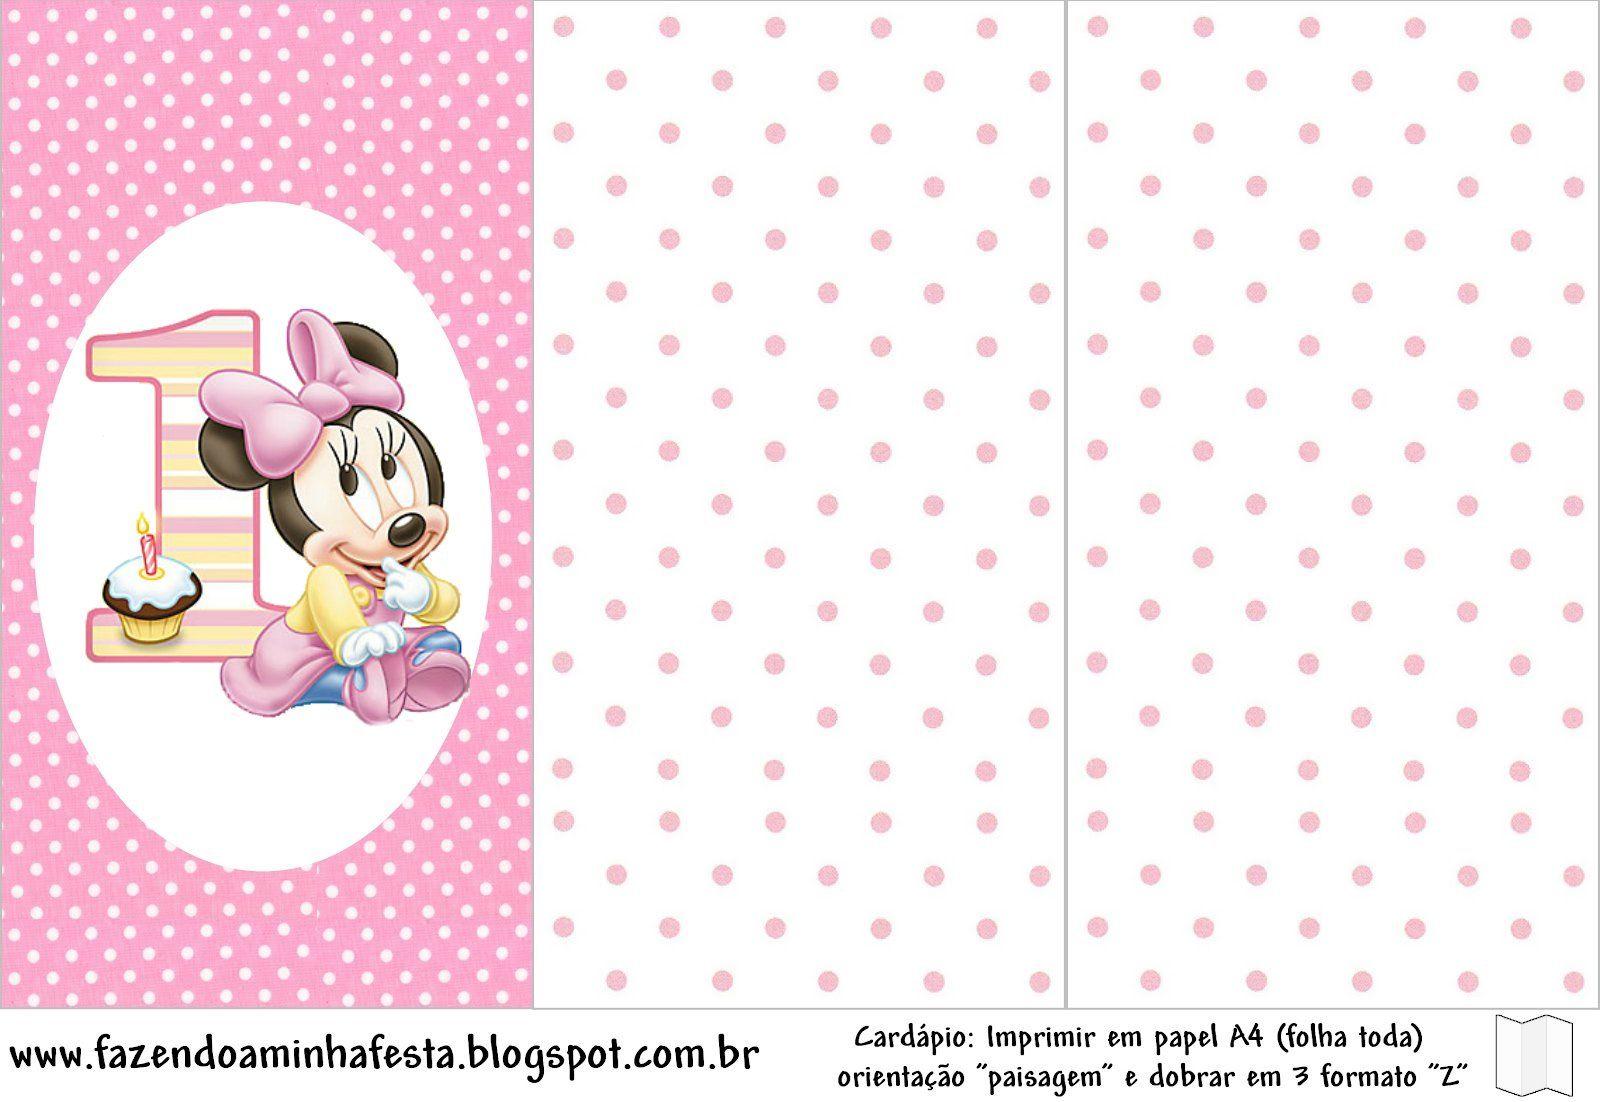 Tarjetas De Cumpleaños 60 Años Mujer Wallpaper En Hd Gratis 5 en HD Gratis tarjetas Pinterest